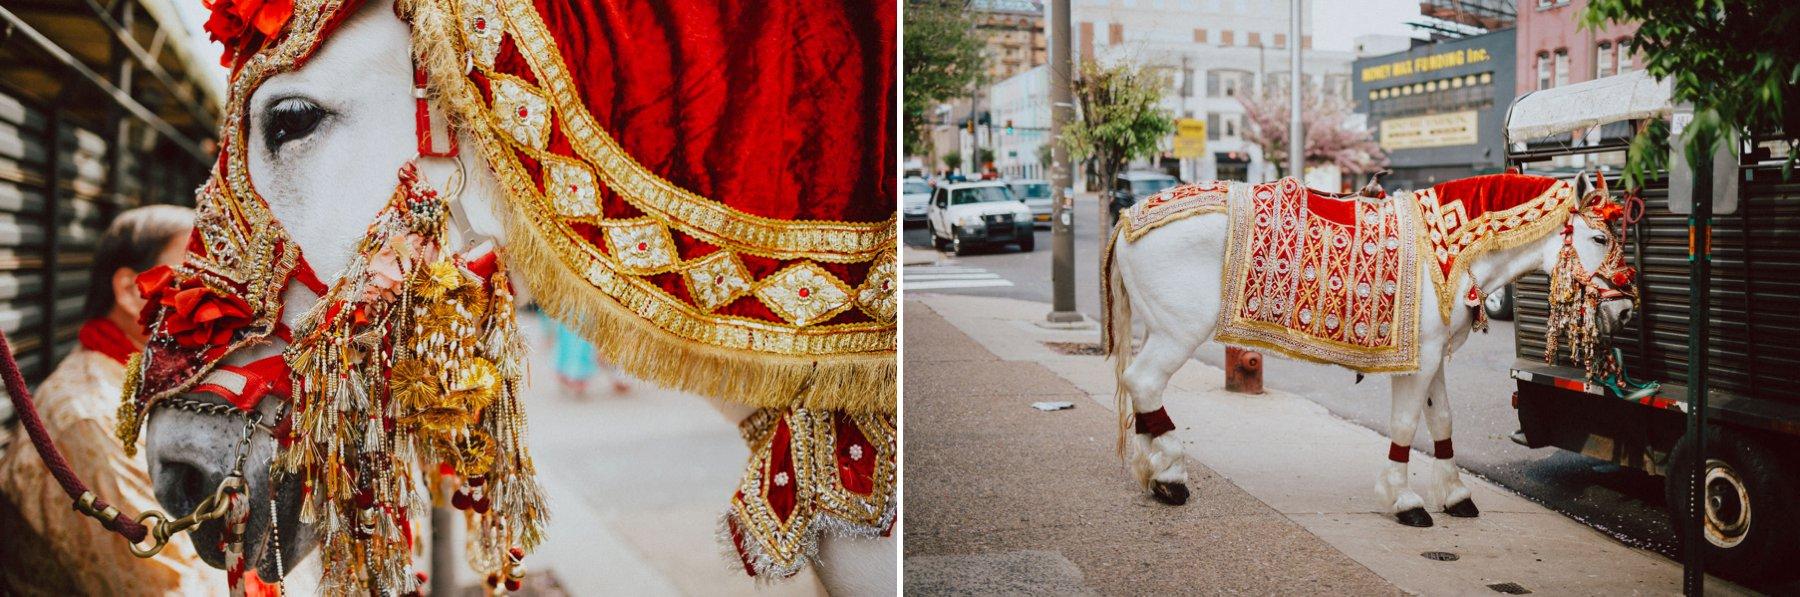 vie-philadelphia-indian-wedding-48.jpg